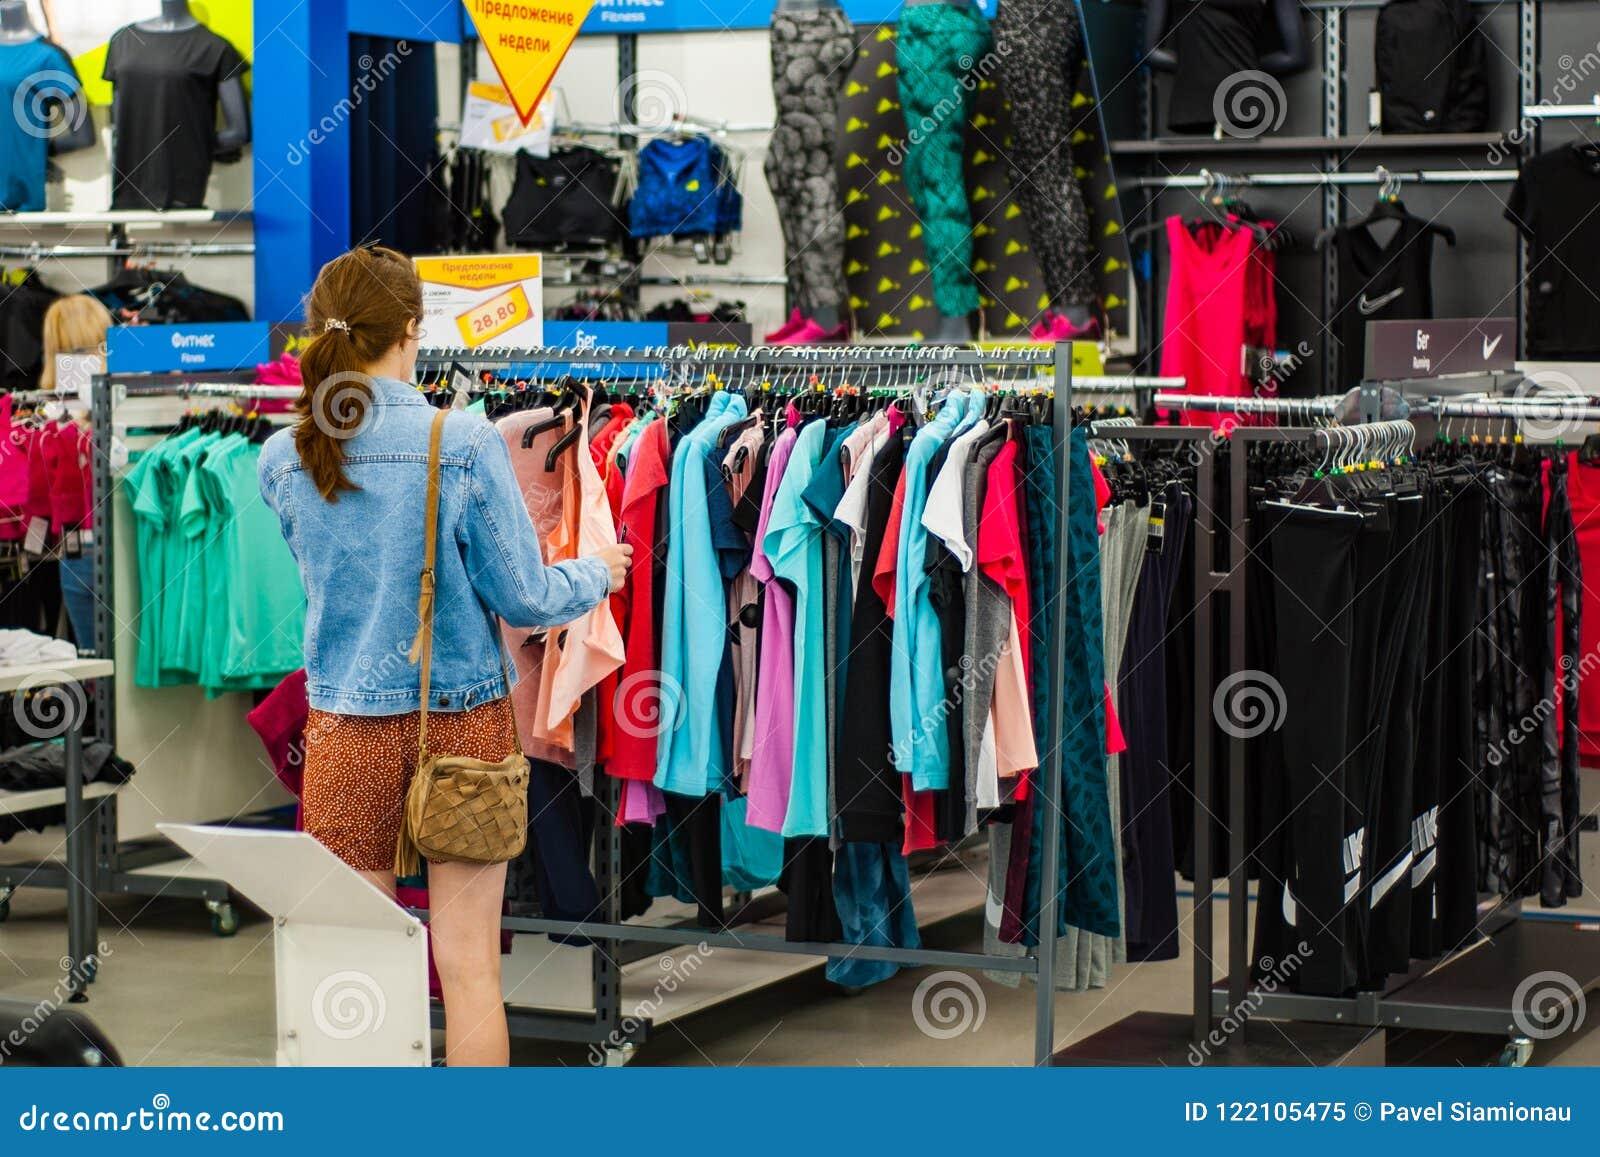 5bea2e08a Minsk, Bielorrússia - 21 de julho de 2018: venda dentro da loja de roupa no  shopping